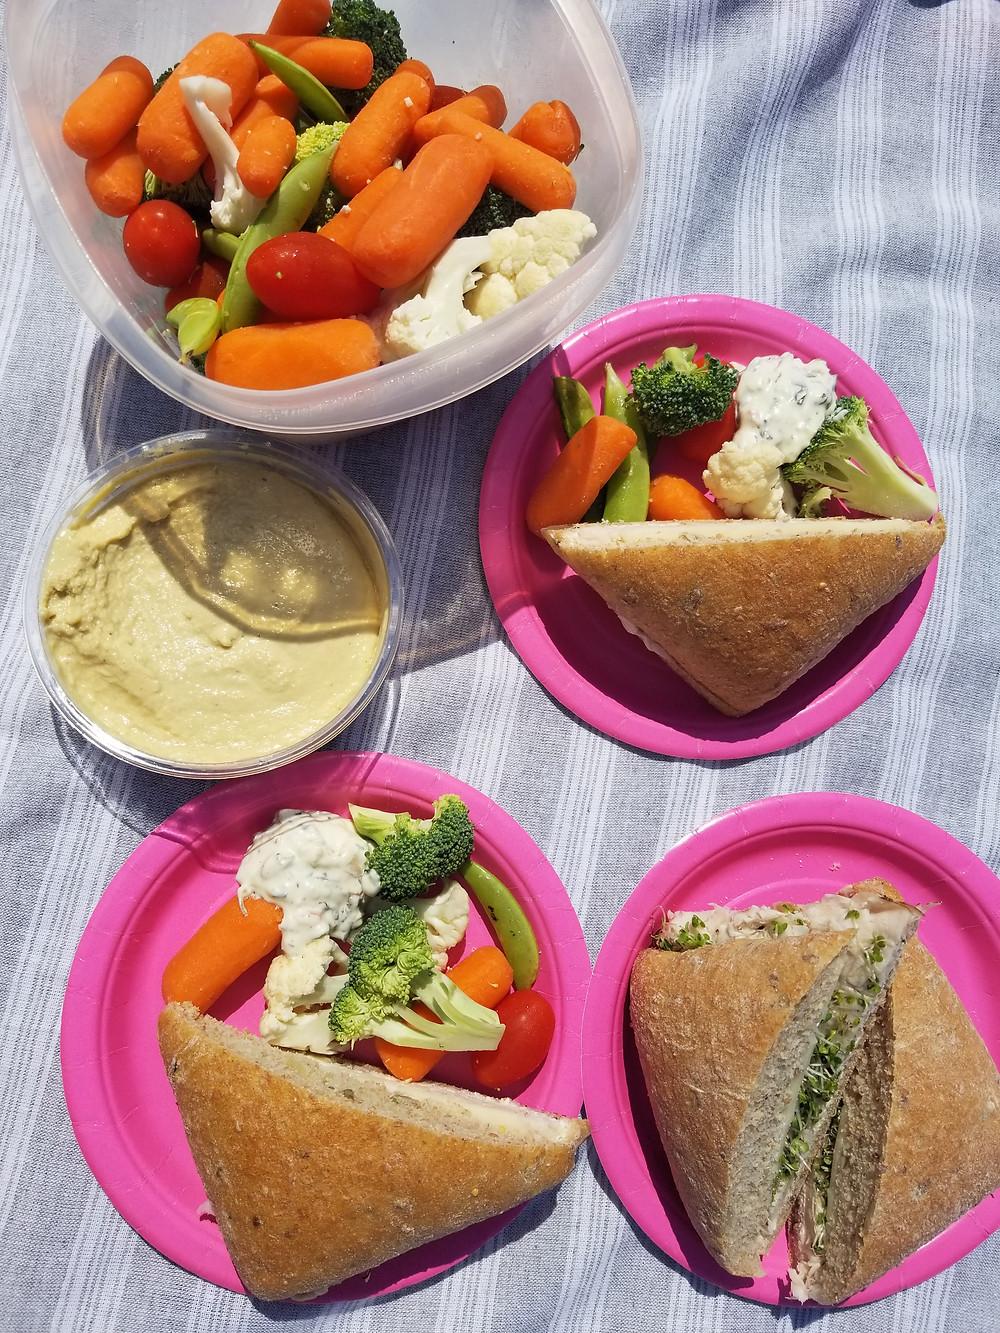 picnic, beach, sandwich, vegetables, healthy lunch